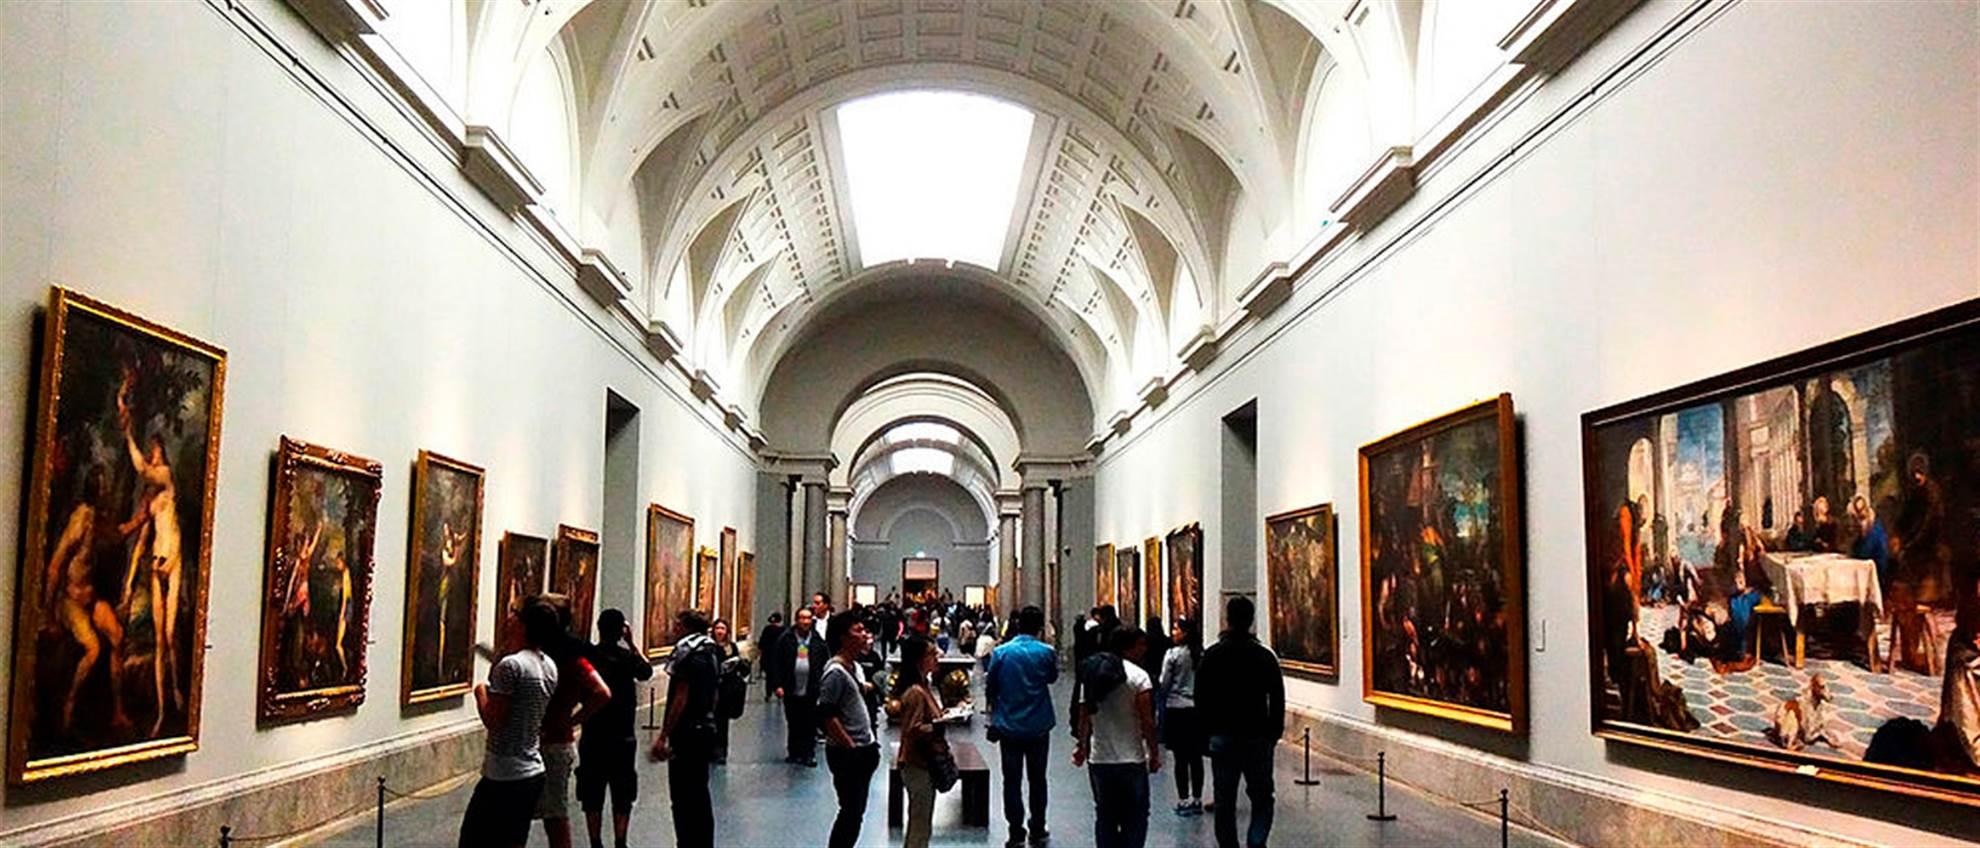 Музей Прадо без очередей